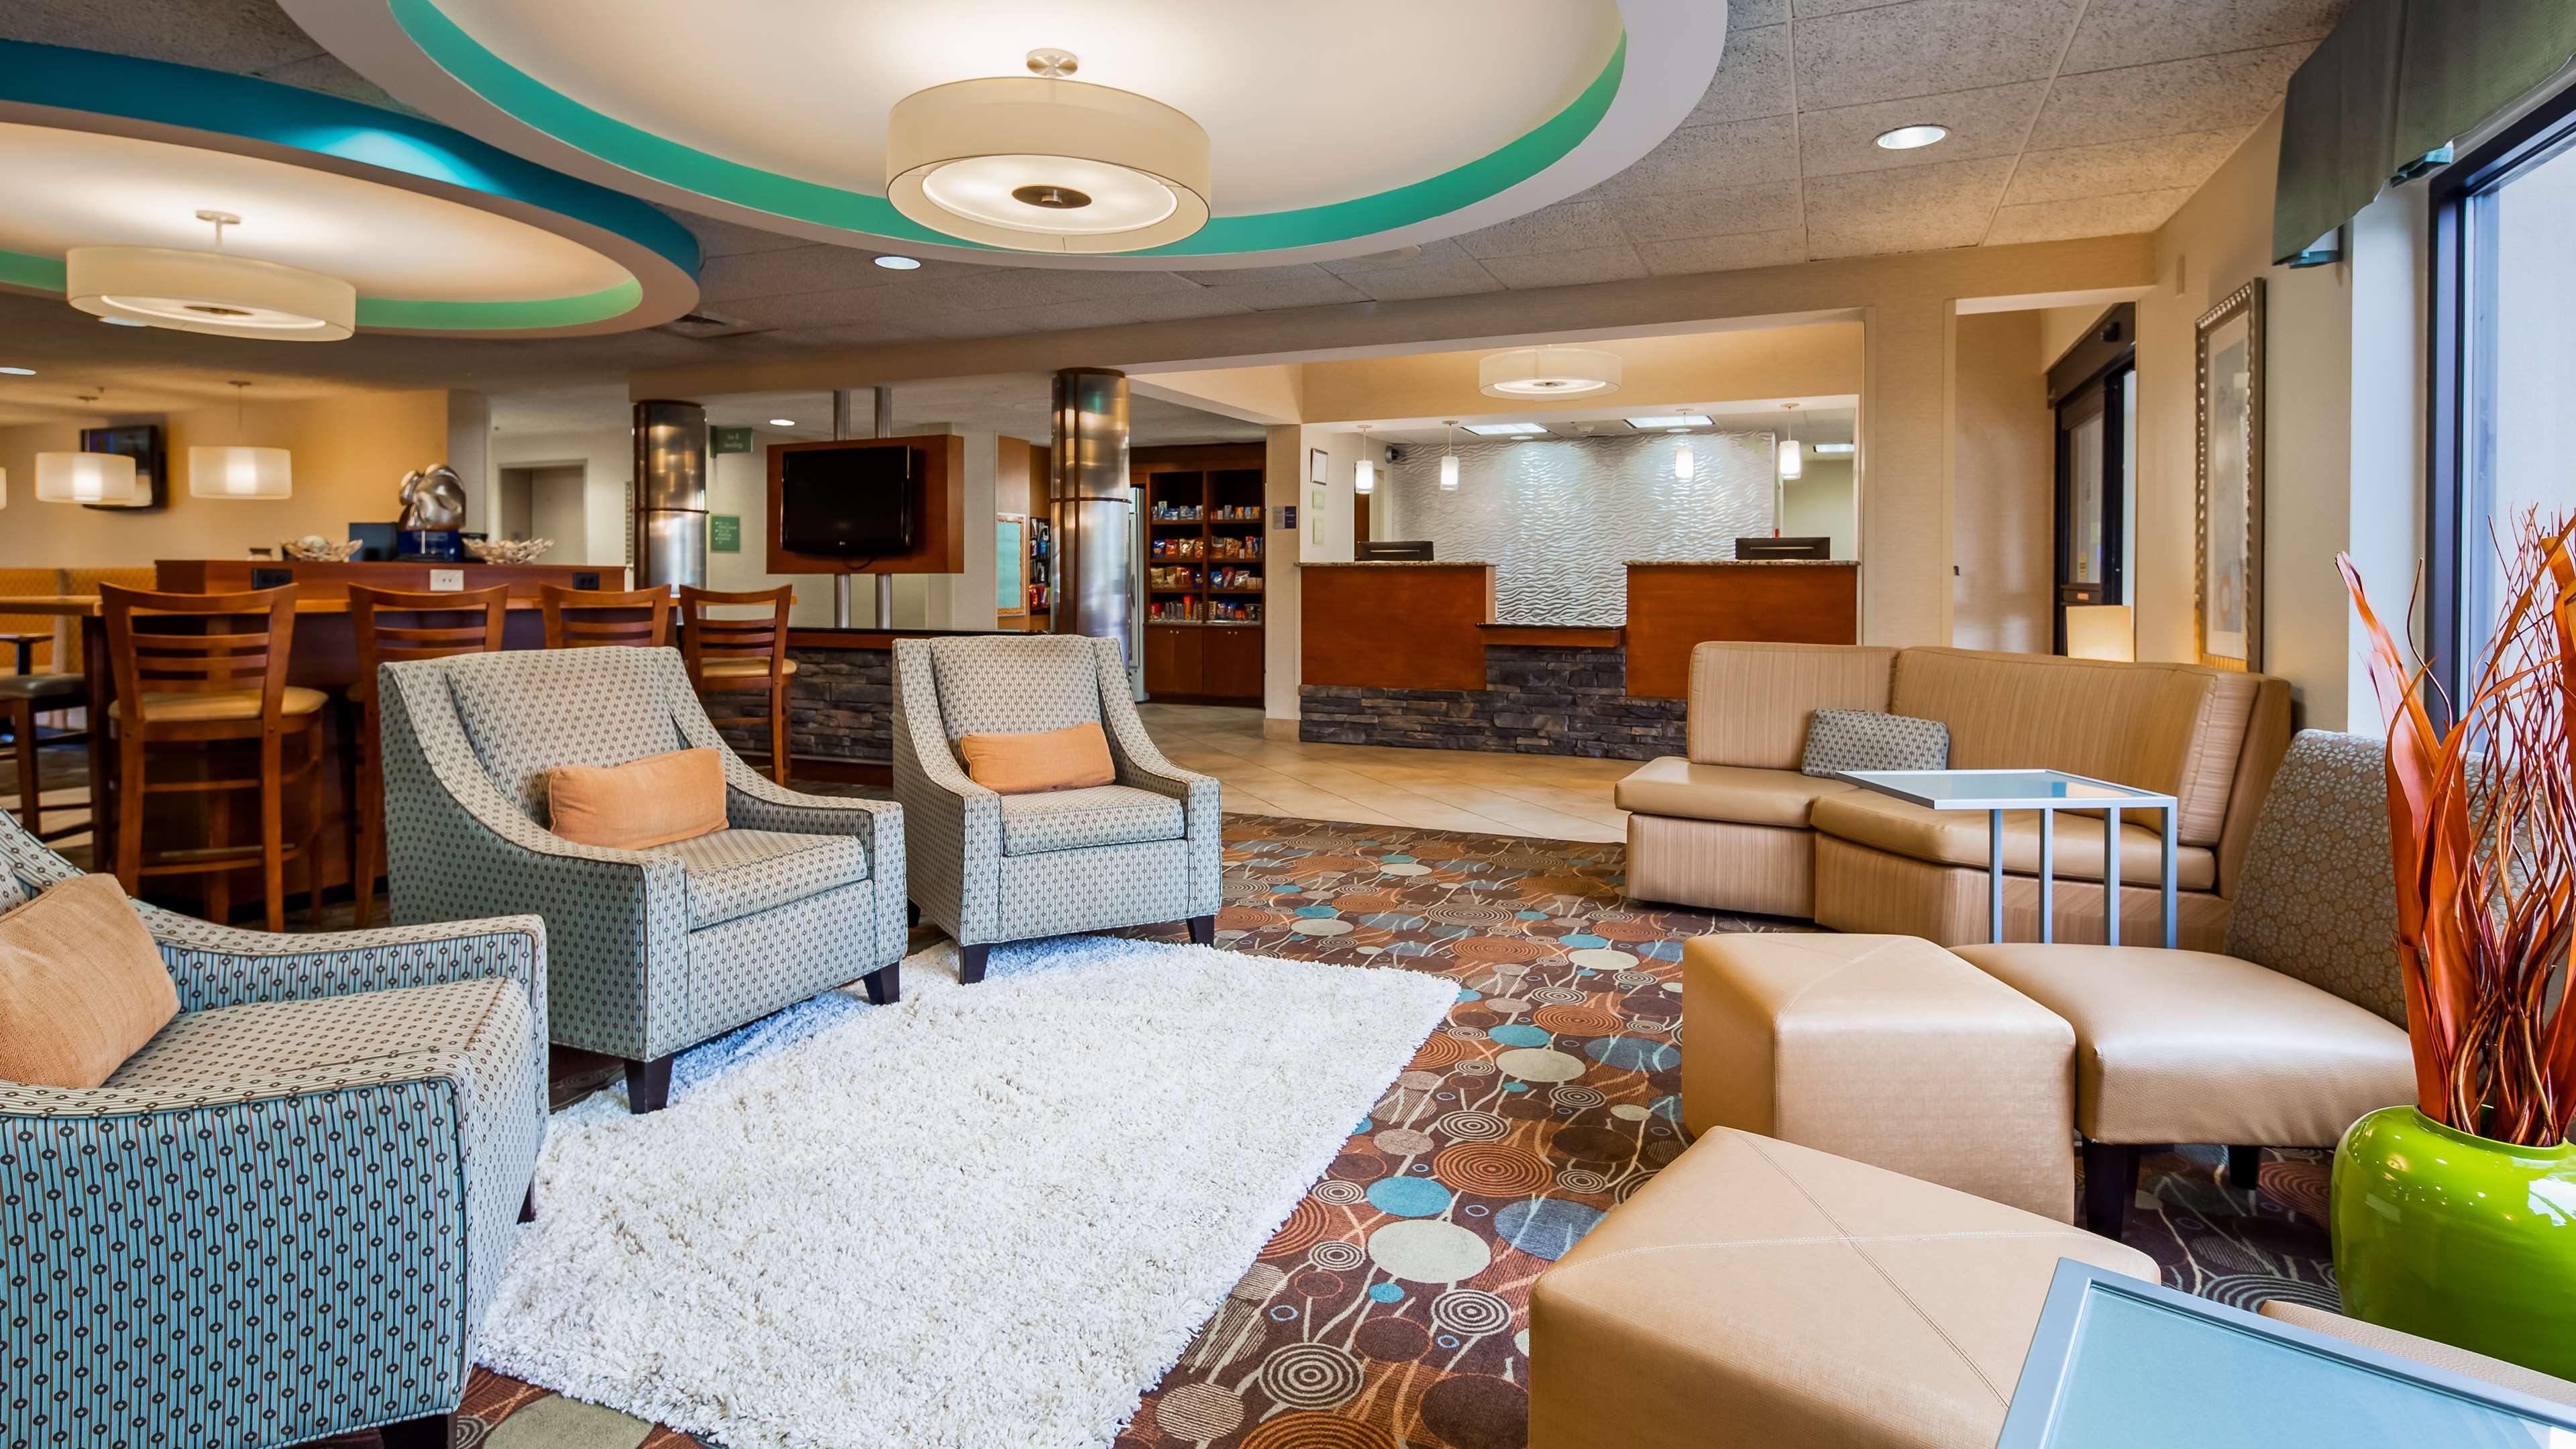 best western plus wilmington wrightsville beach. Black Bedroom Furniture Sets. Home Design Ideas